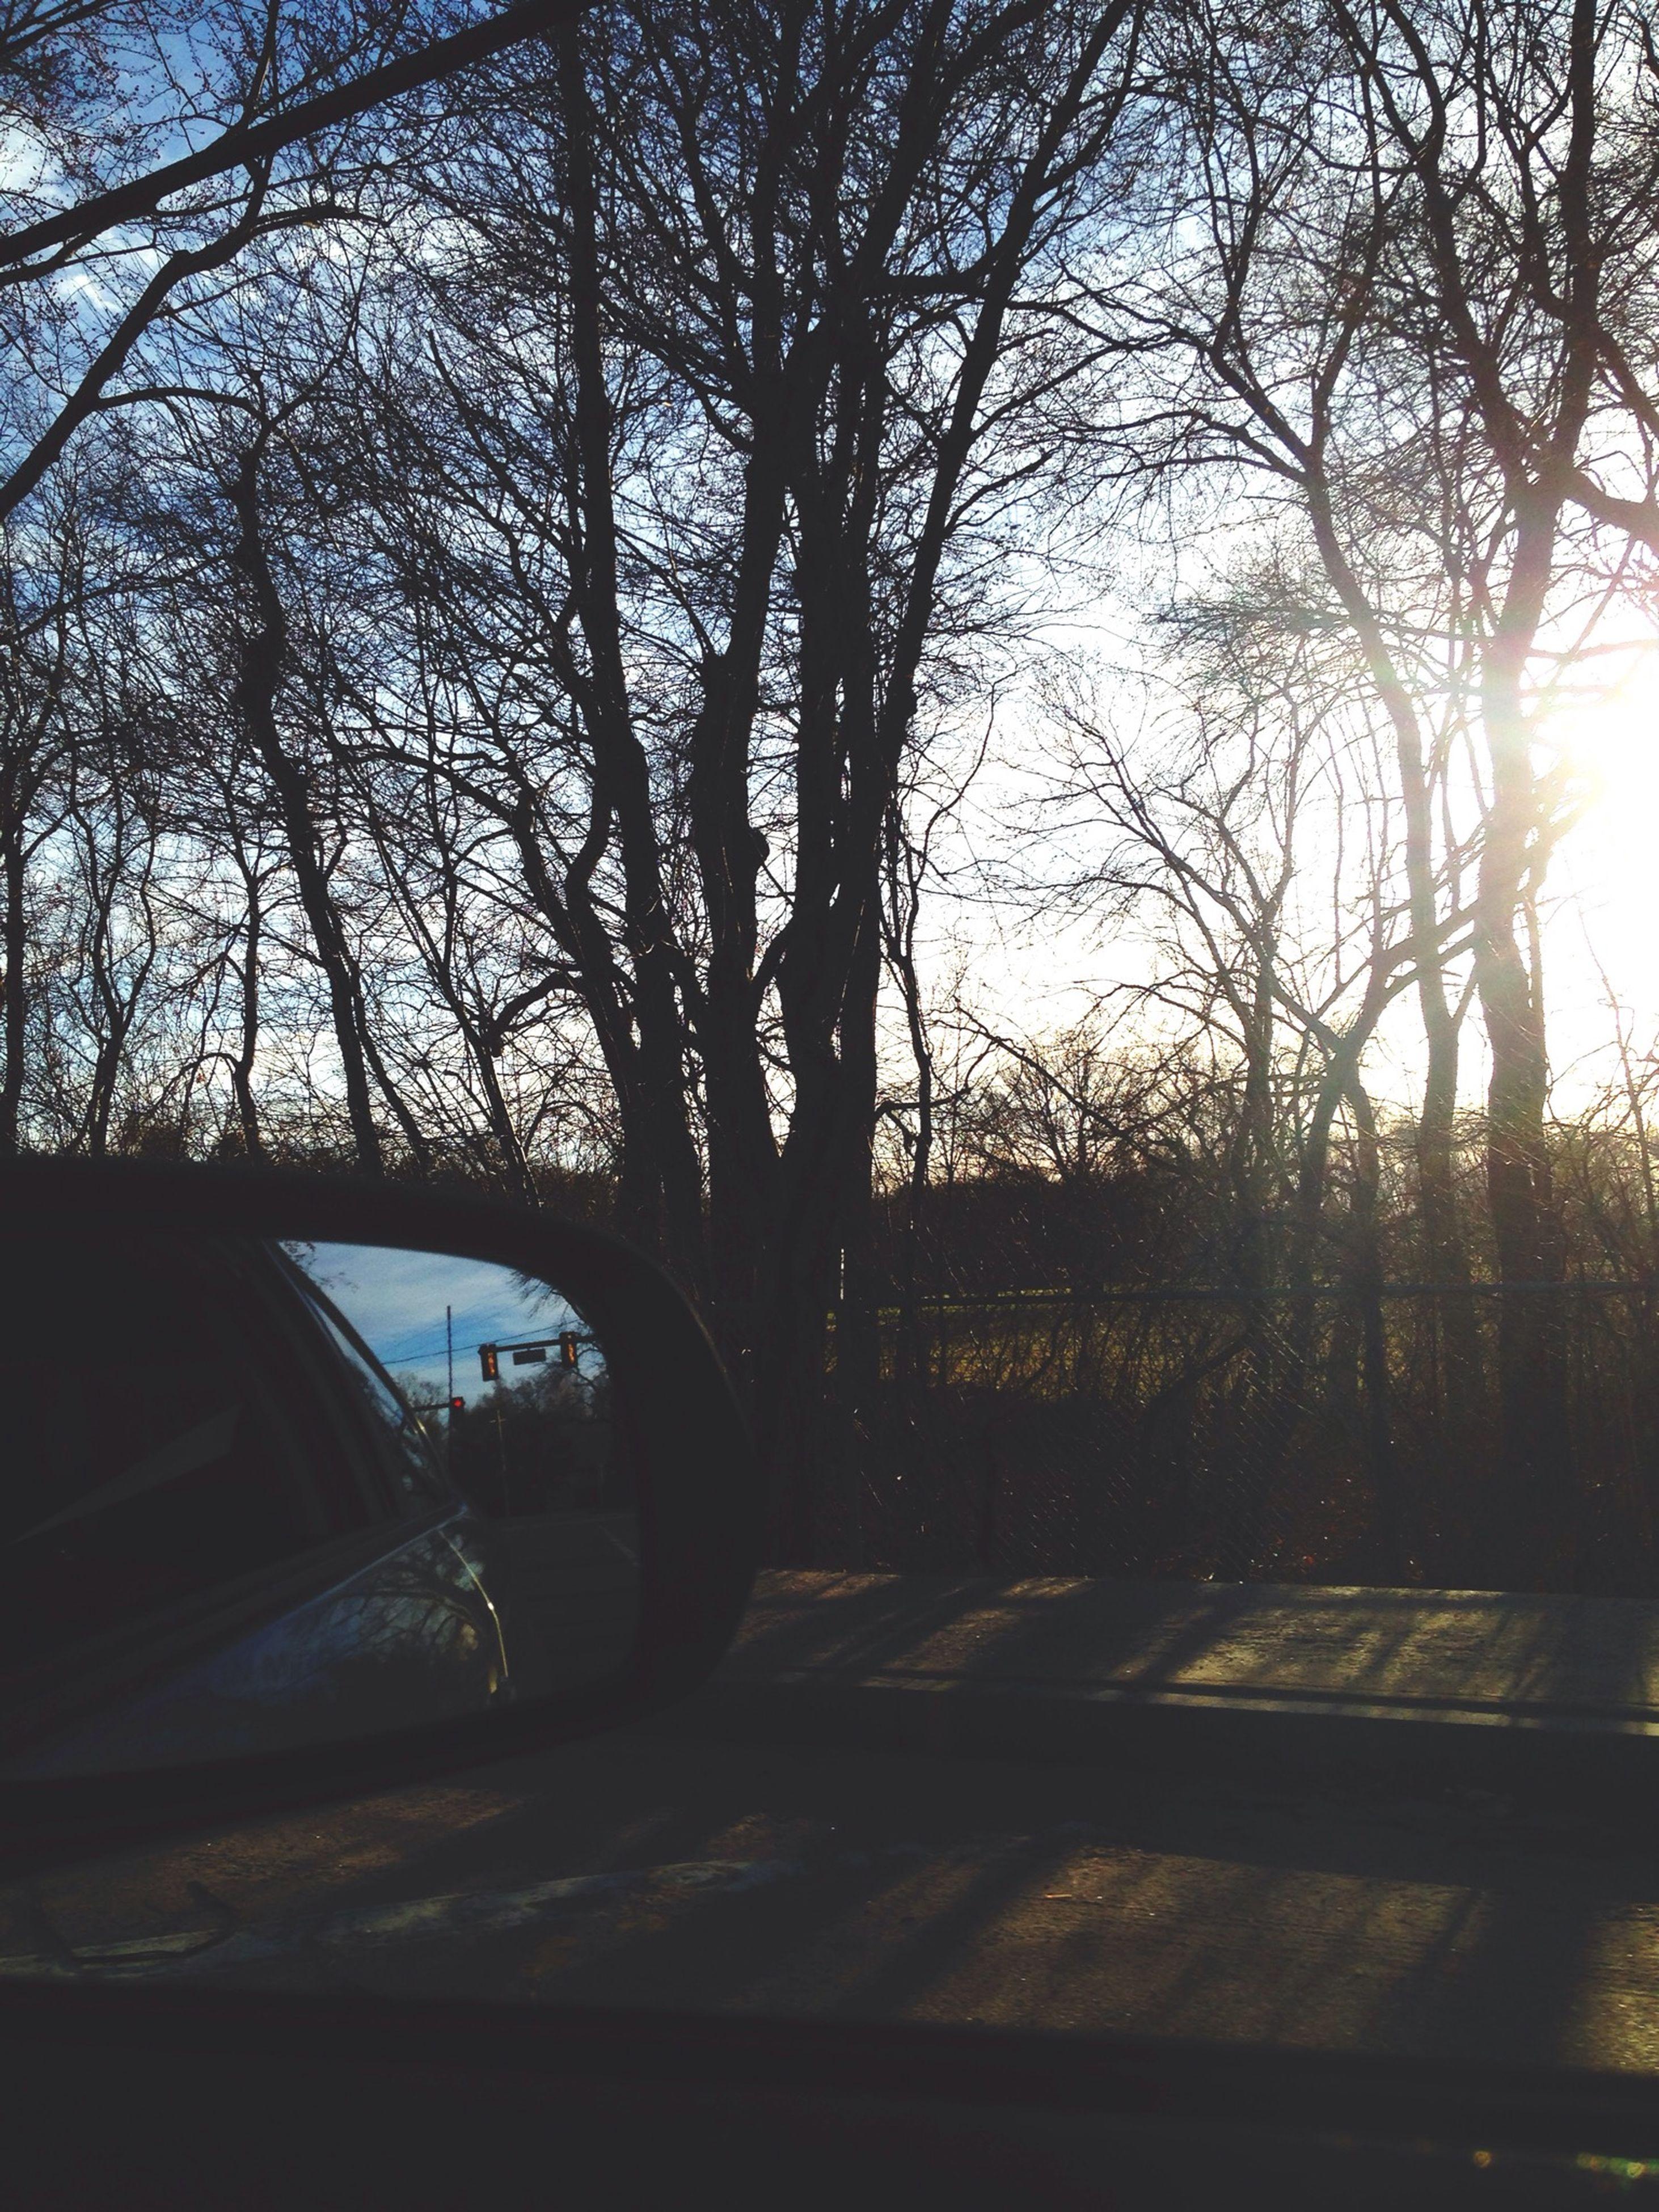 transportation, tree, car, land vehicle, mode of transport, bare tree, sun, road, sunset, sunlight, silhouette, street, branch, sky, sunbeam, nature, lens flare, travel, no people, clear sky